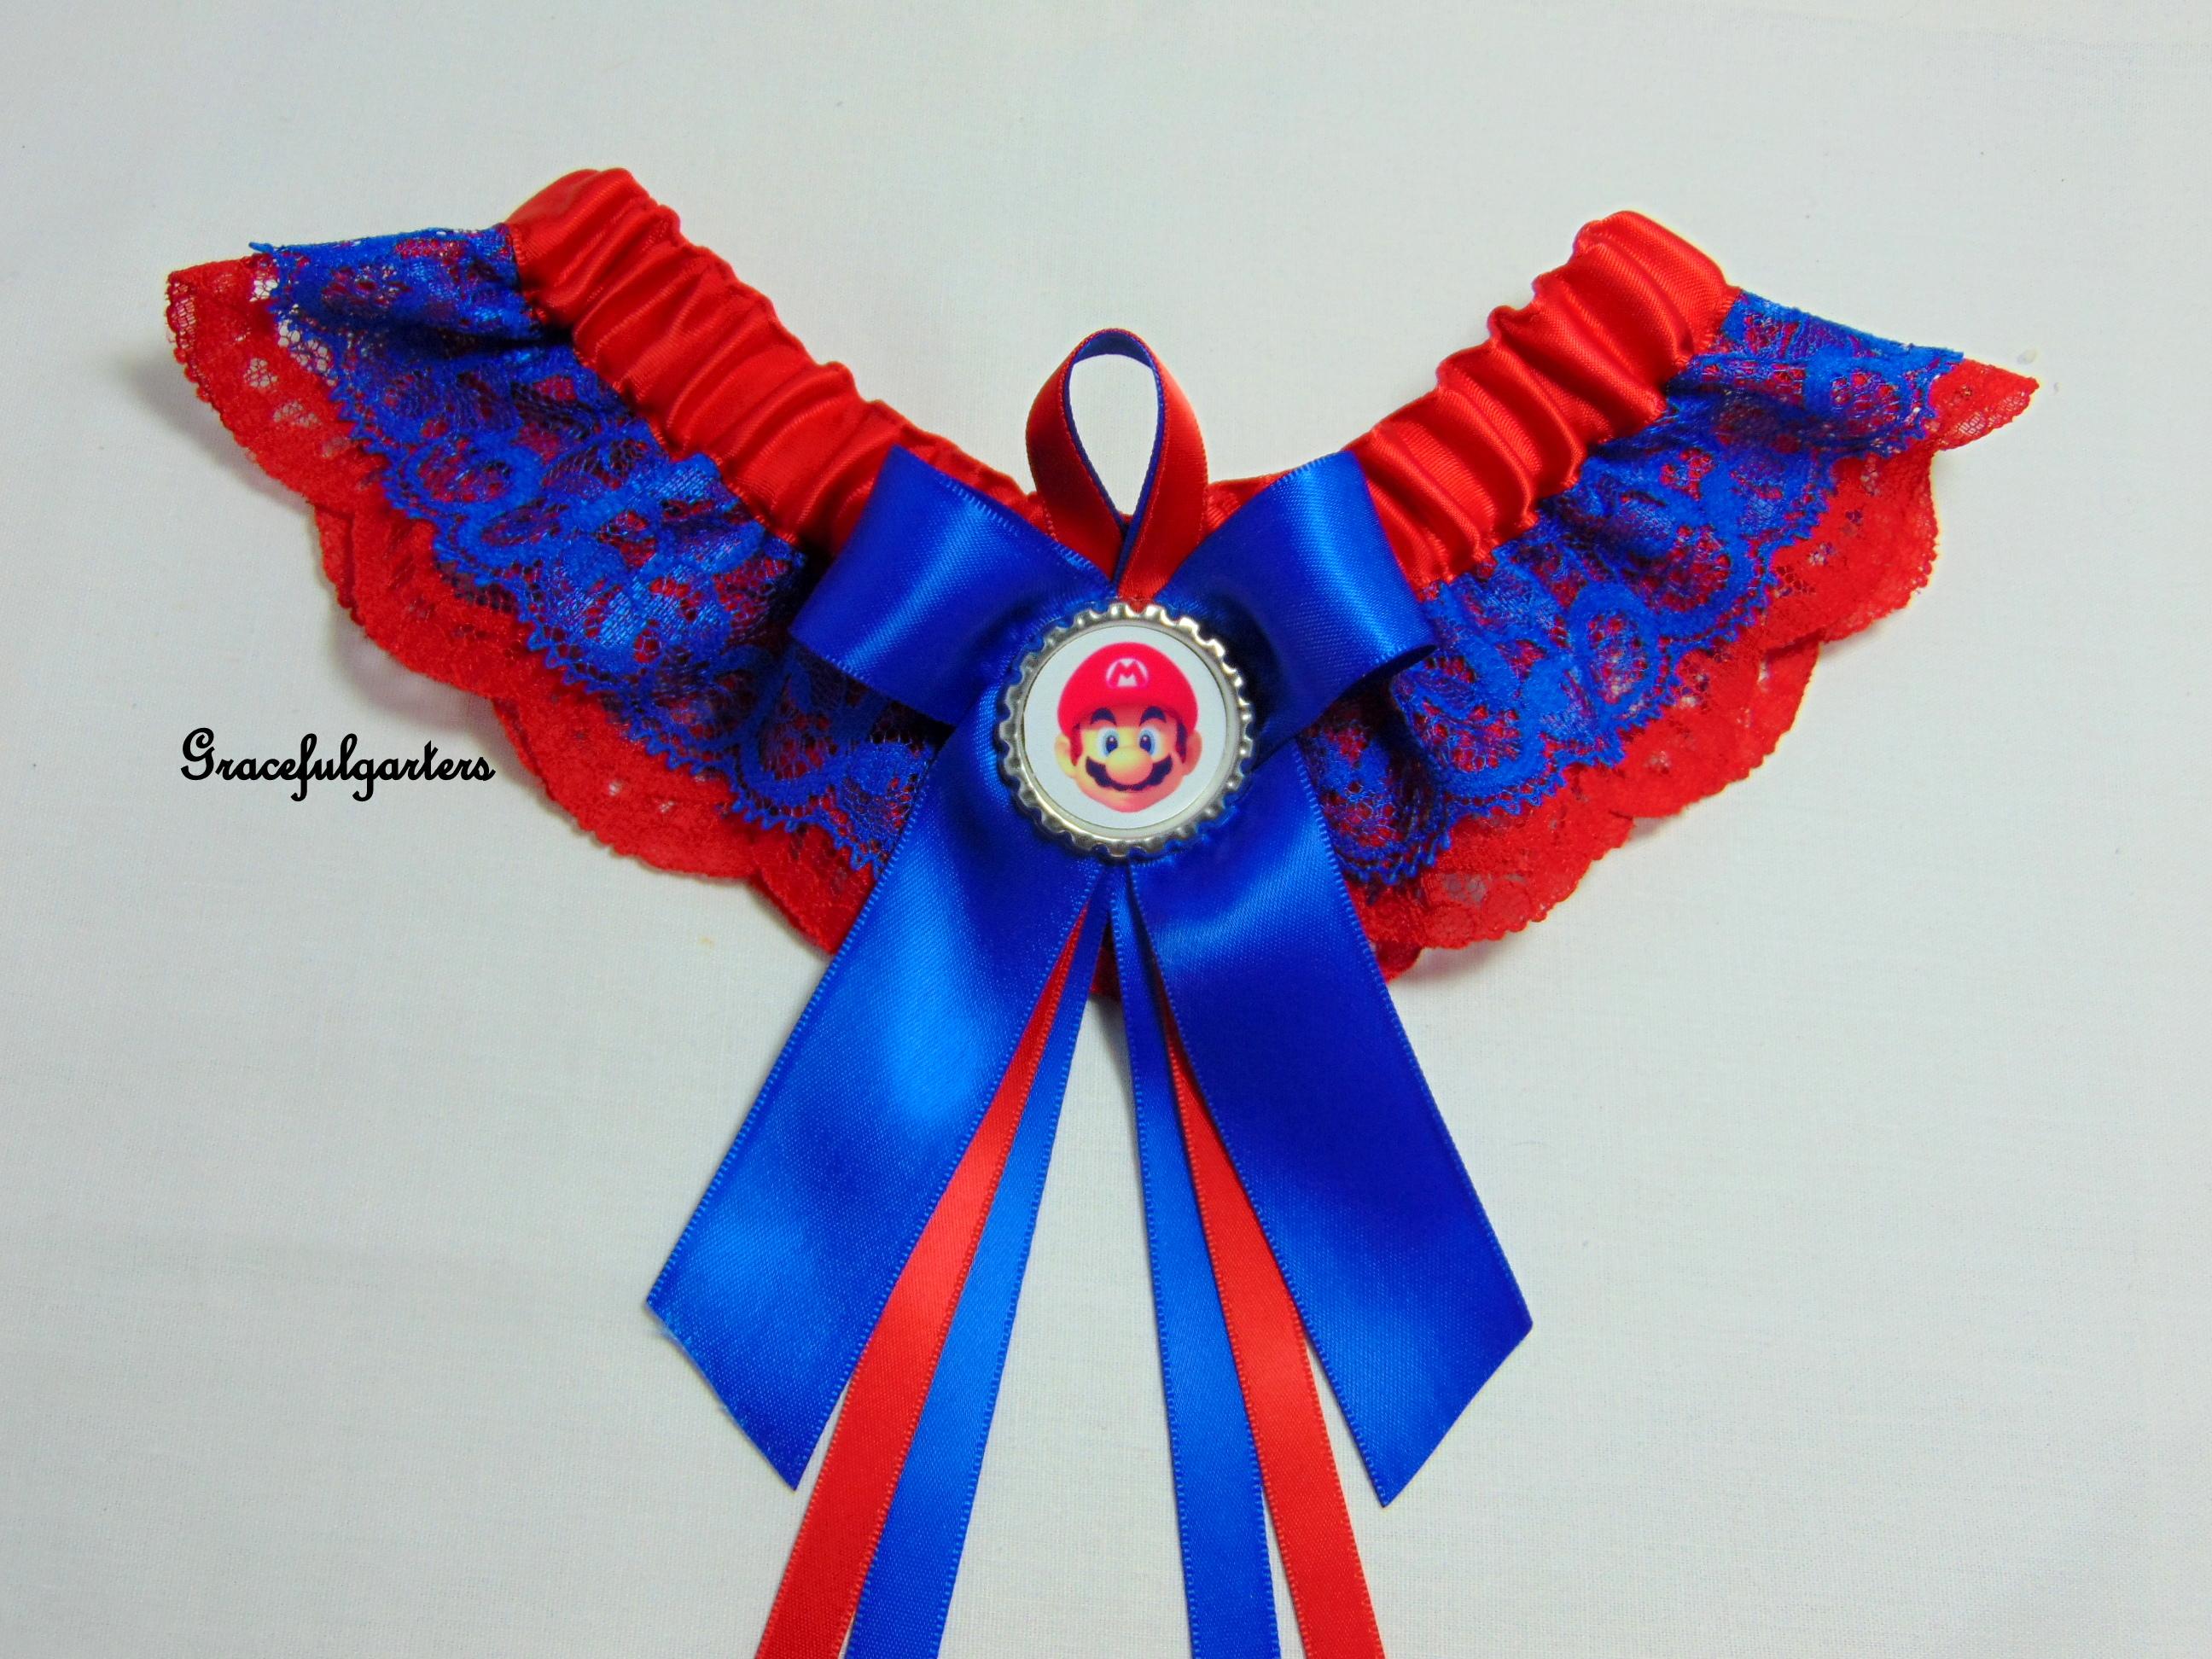 Super Mario Lace Bridal Wedding Garter